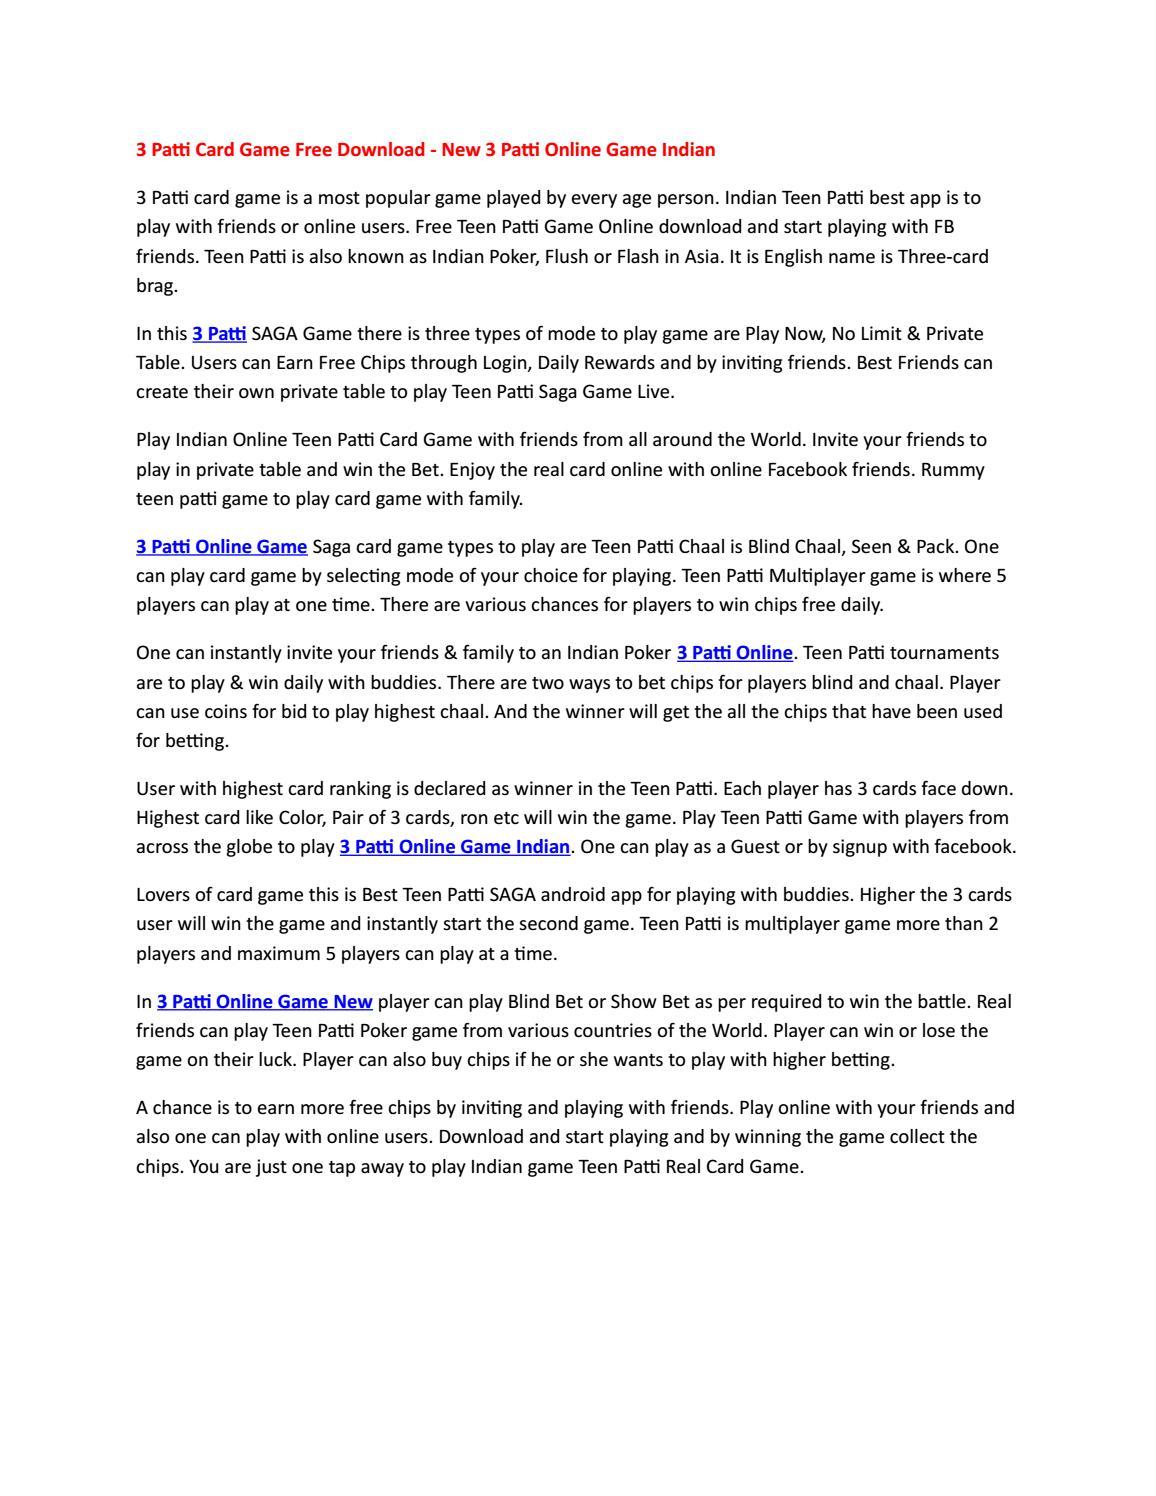 3 Patti Card Game Free Download New 3 Patti Online Game Indian By 3pattisaga Issuu